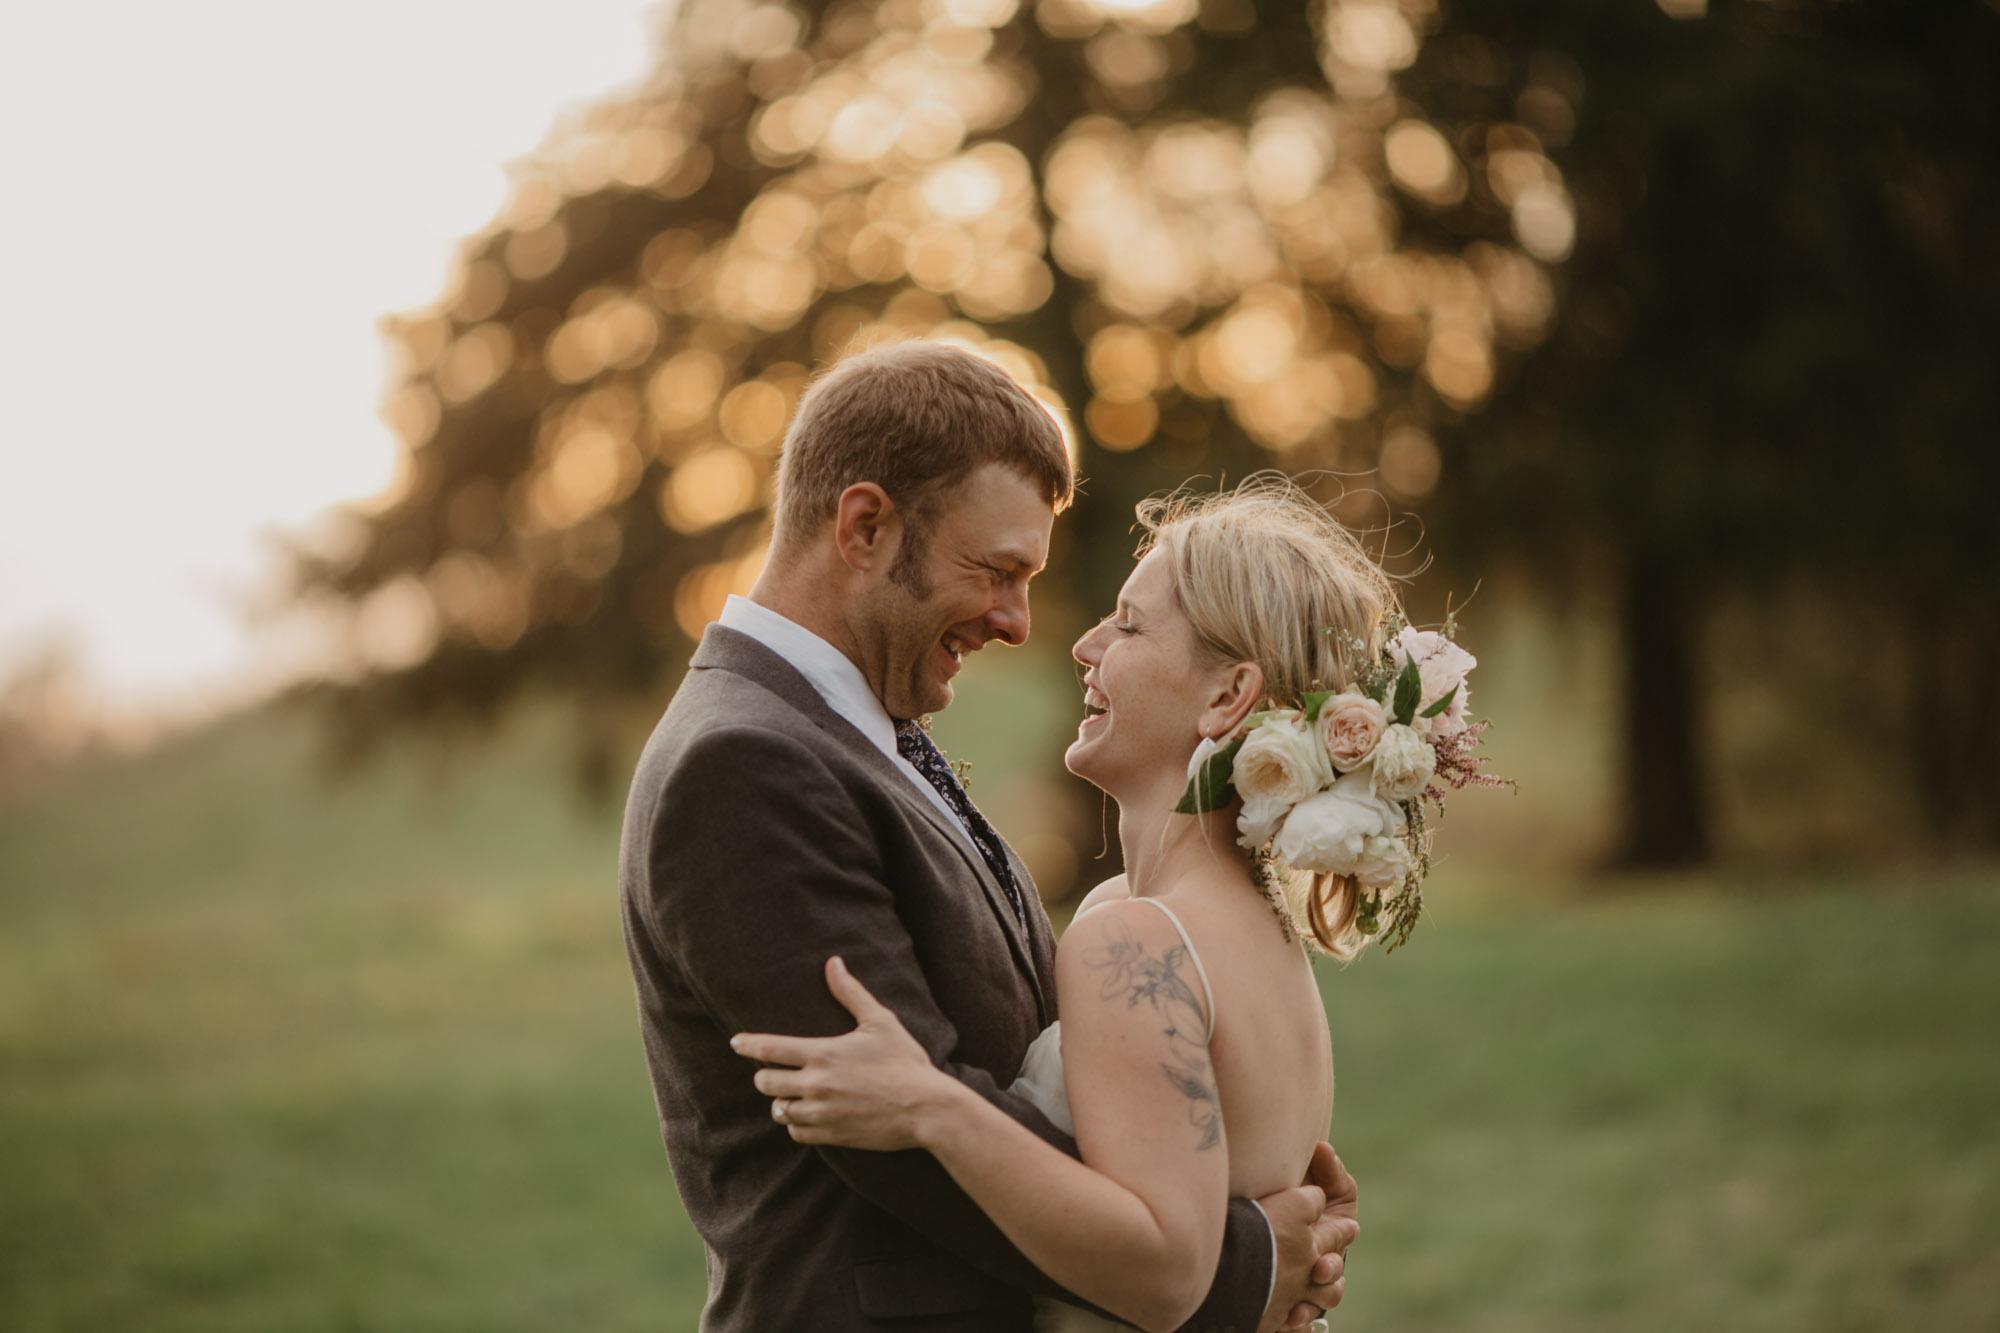 omaha-wedding-photographer-meghan-time-49.jpg